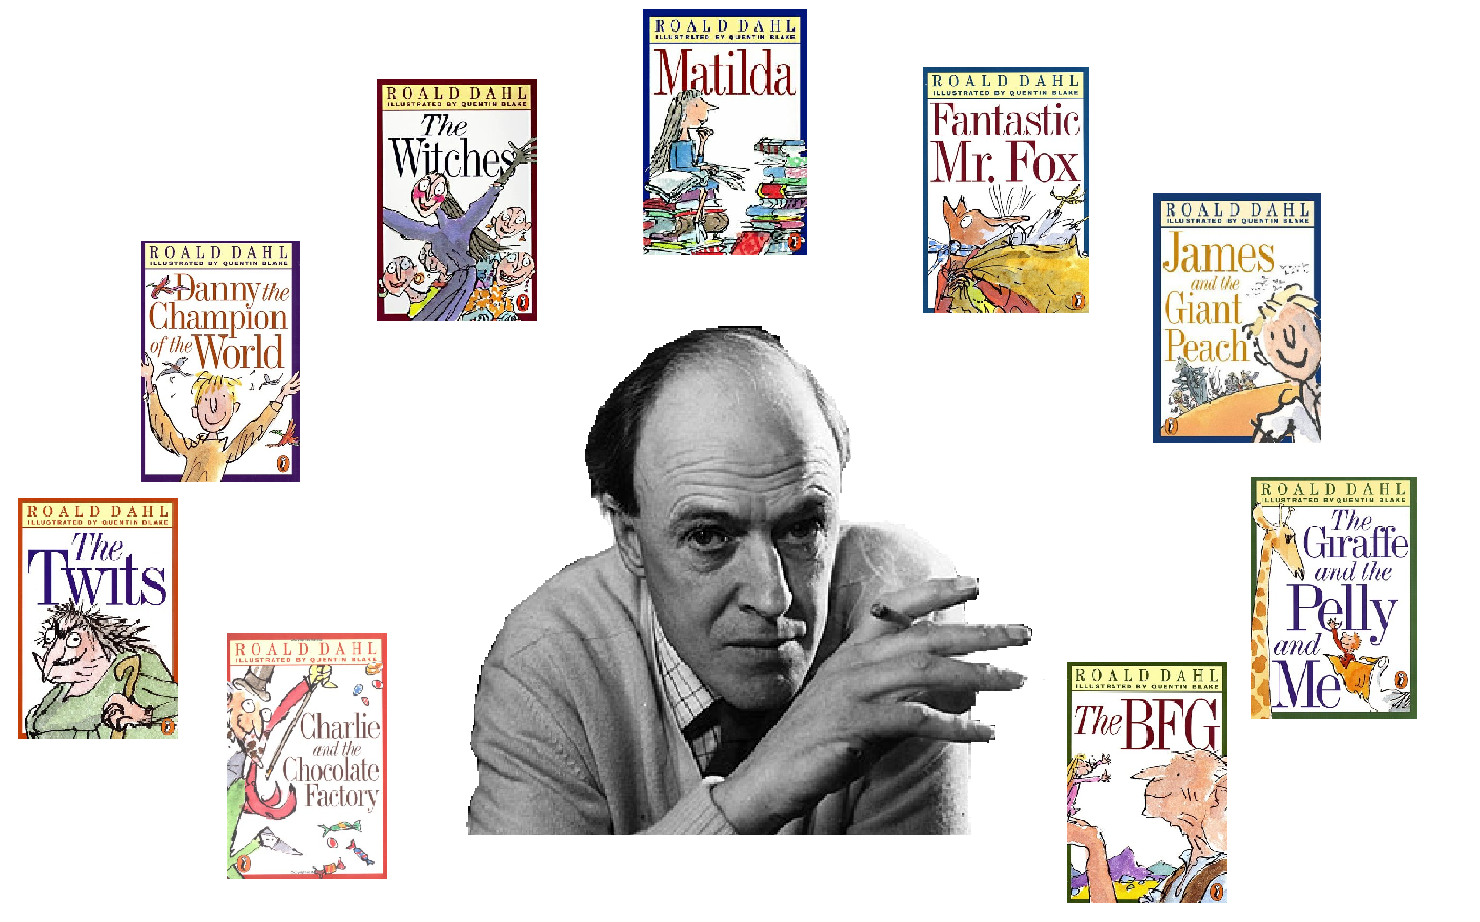 Roald Dahl | Roald dahl, Roald dahl day, Dahl